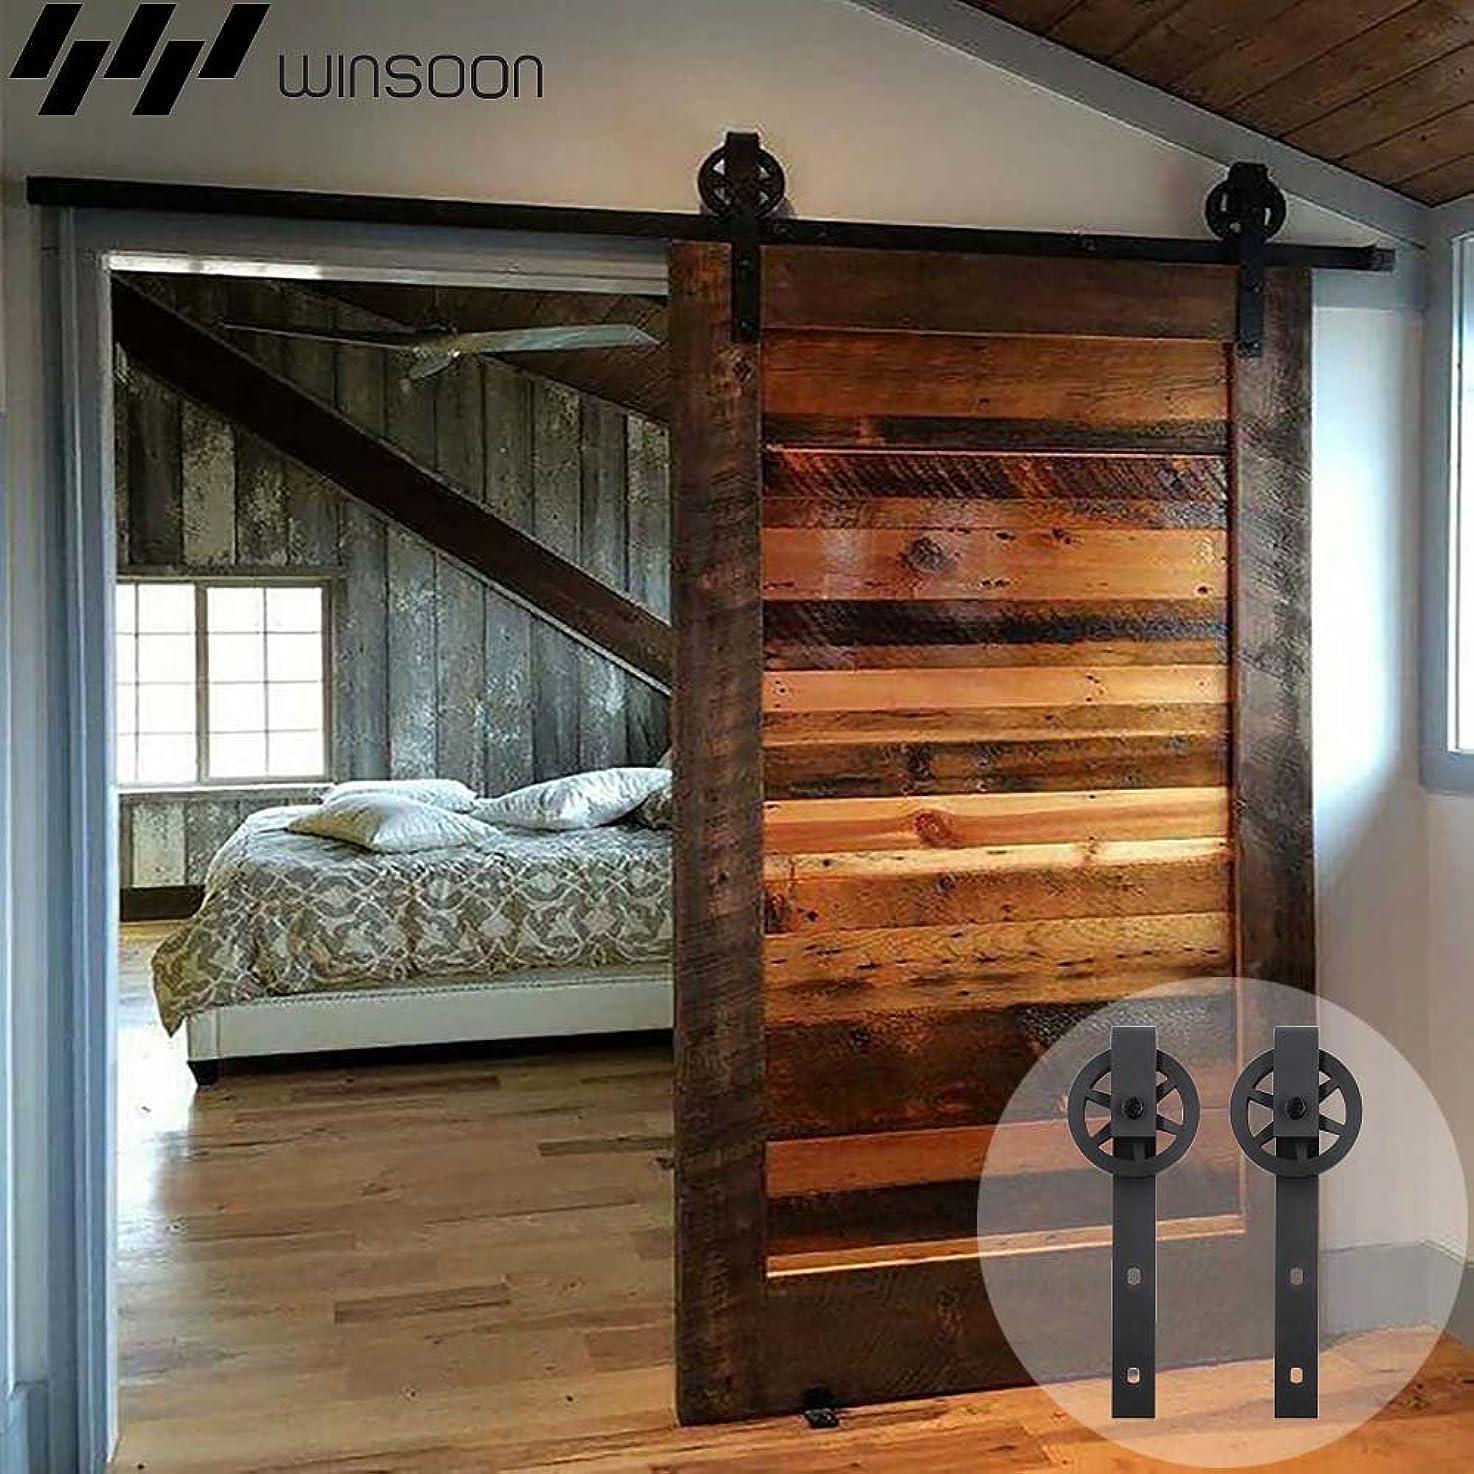 WINSOON Sliding Barn Door Hardware 9ft Track Single Door Kit Low Ceiling for Window Cabinet TV Stand, I Shape Hooks